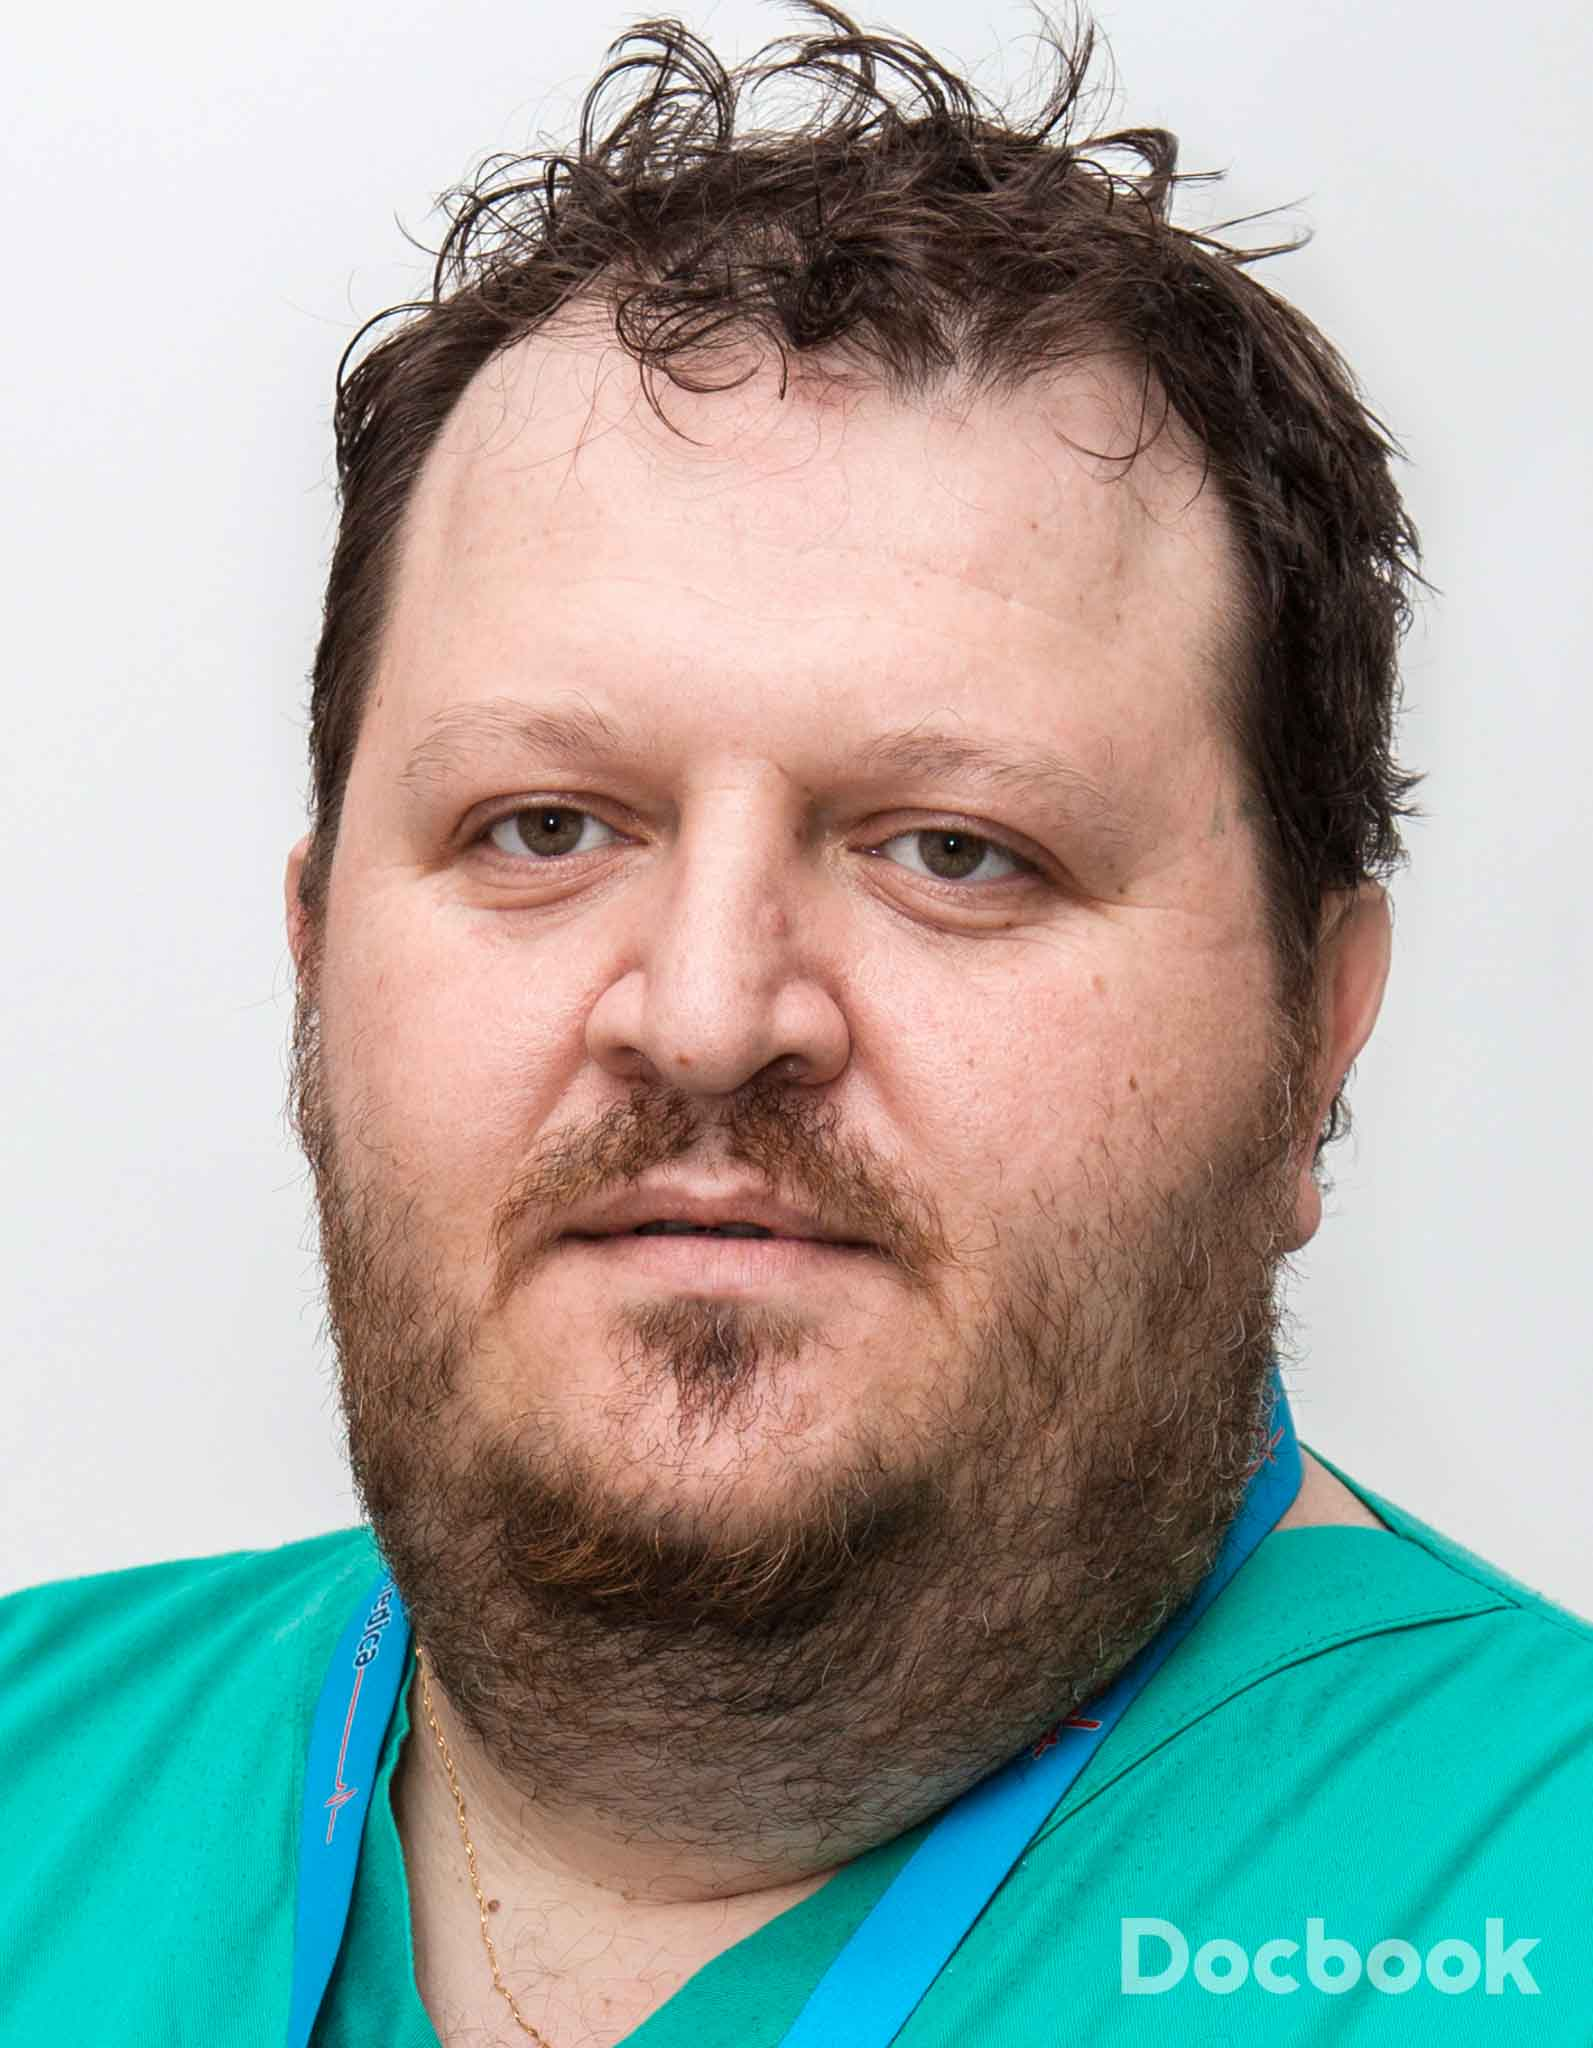 Dr. Juxhin Qendro